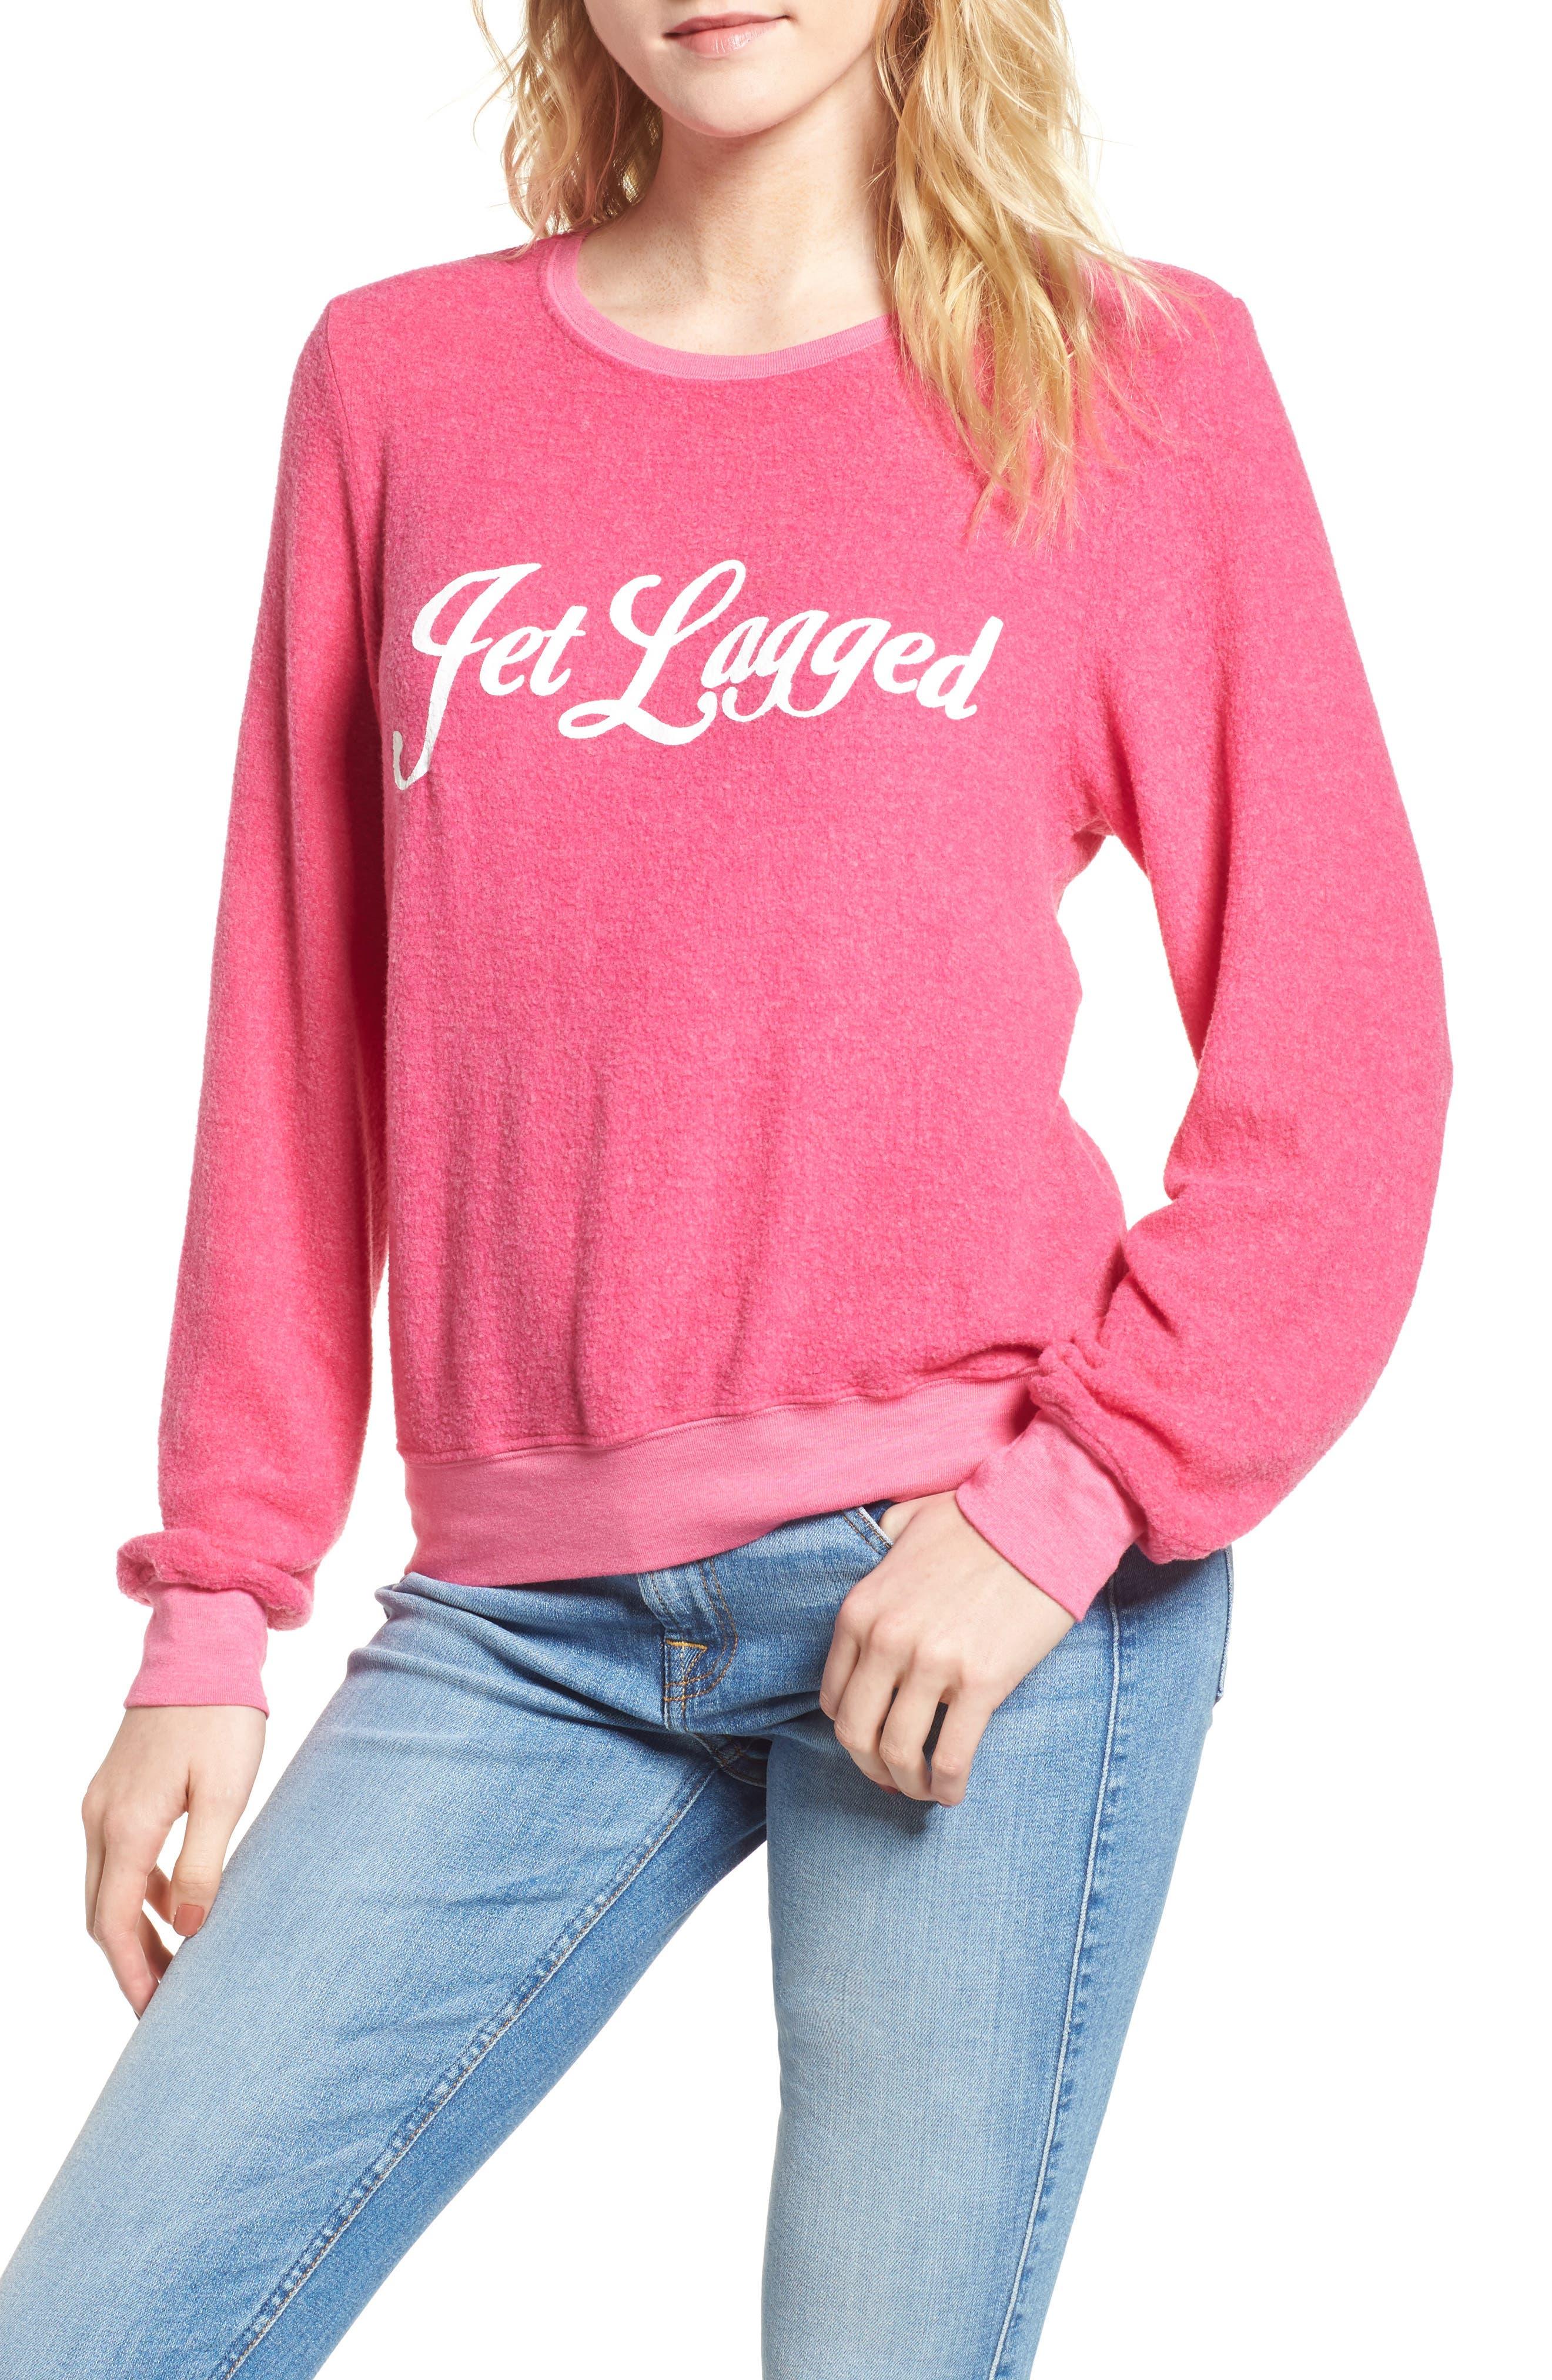 Jet Lagged Sweatshirt,                         Main,                         color, Malibu Pink